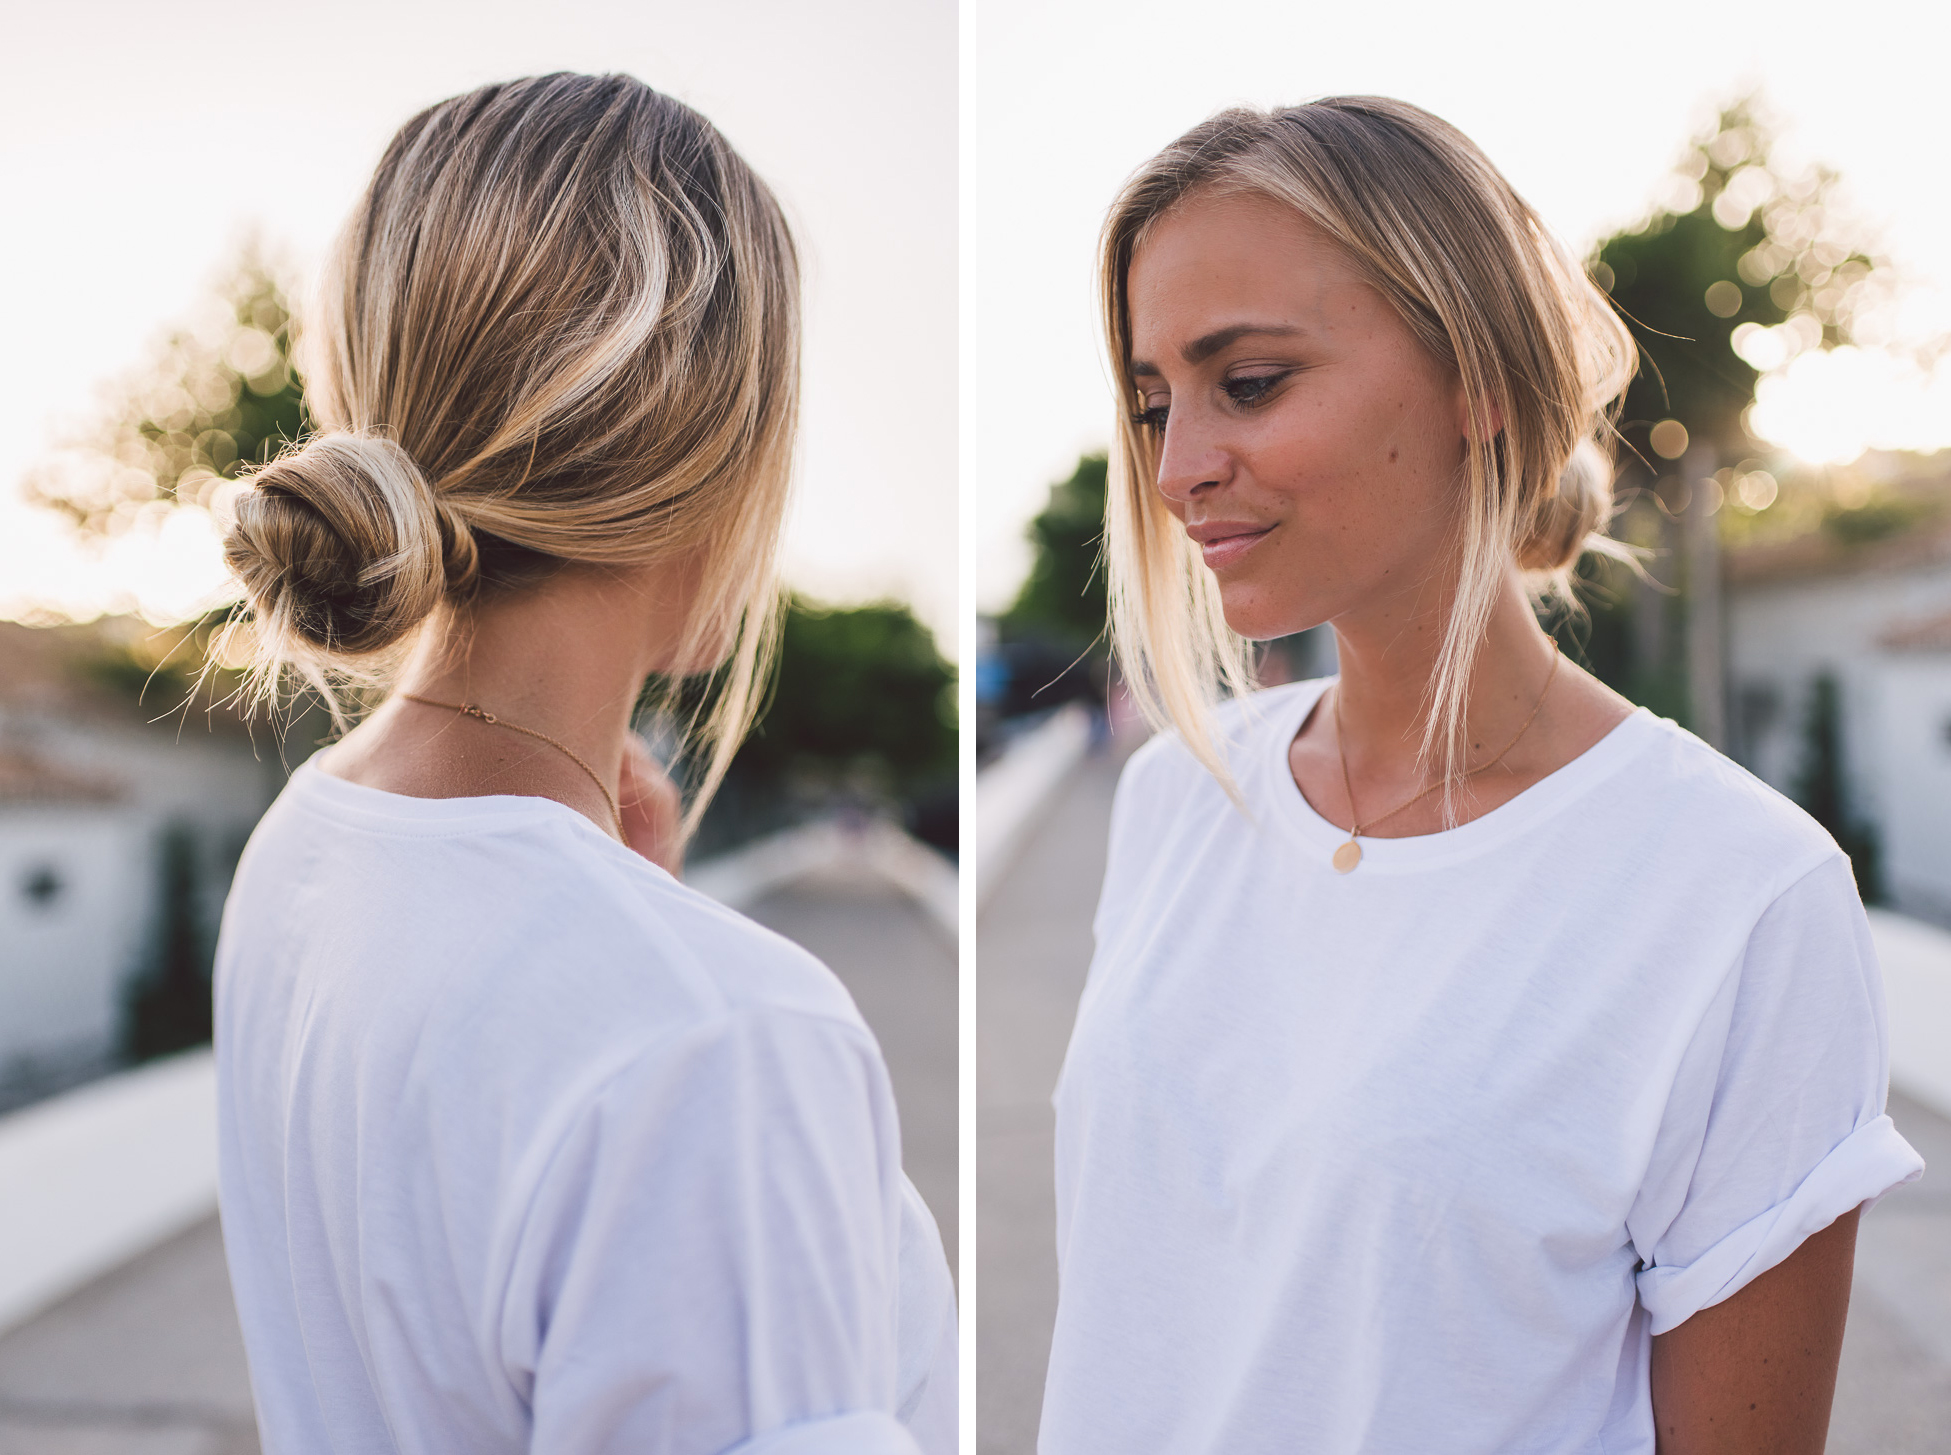 janni-deler-tresseme-hairstyleDSC_8820